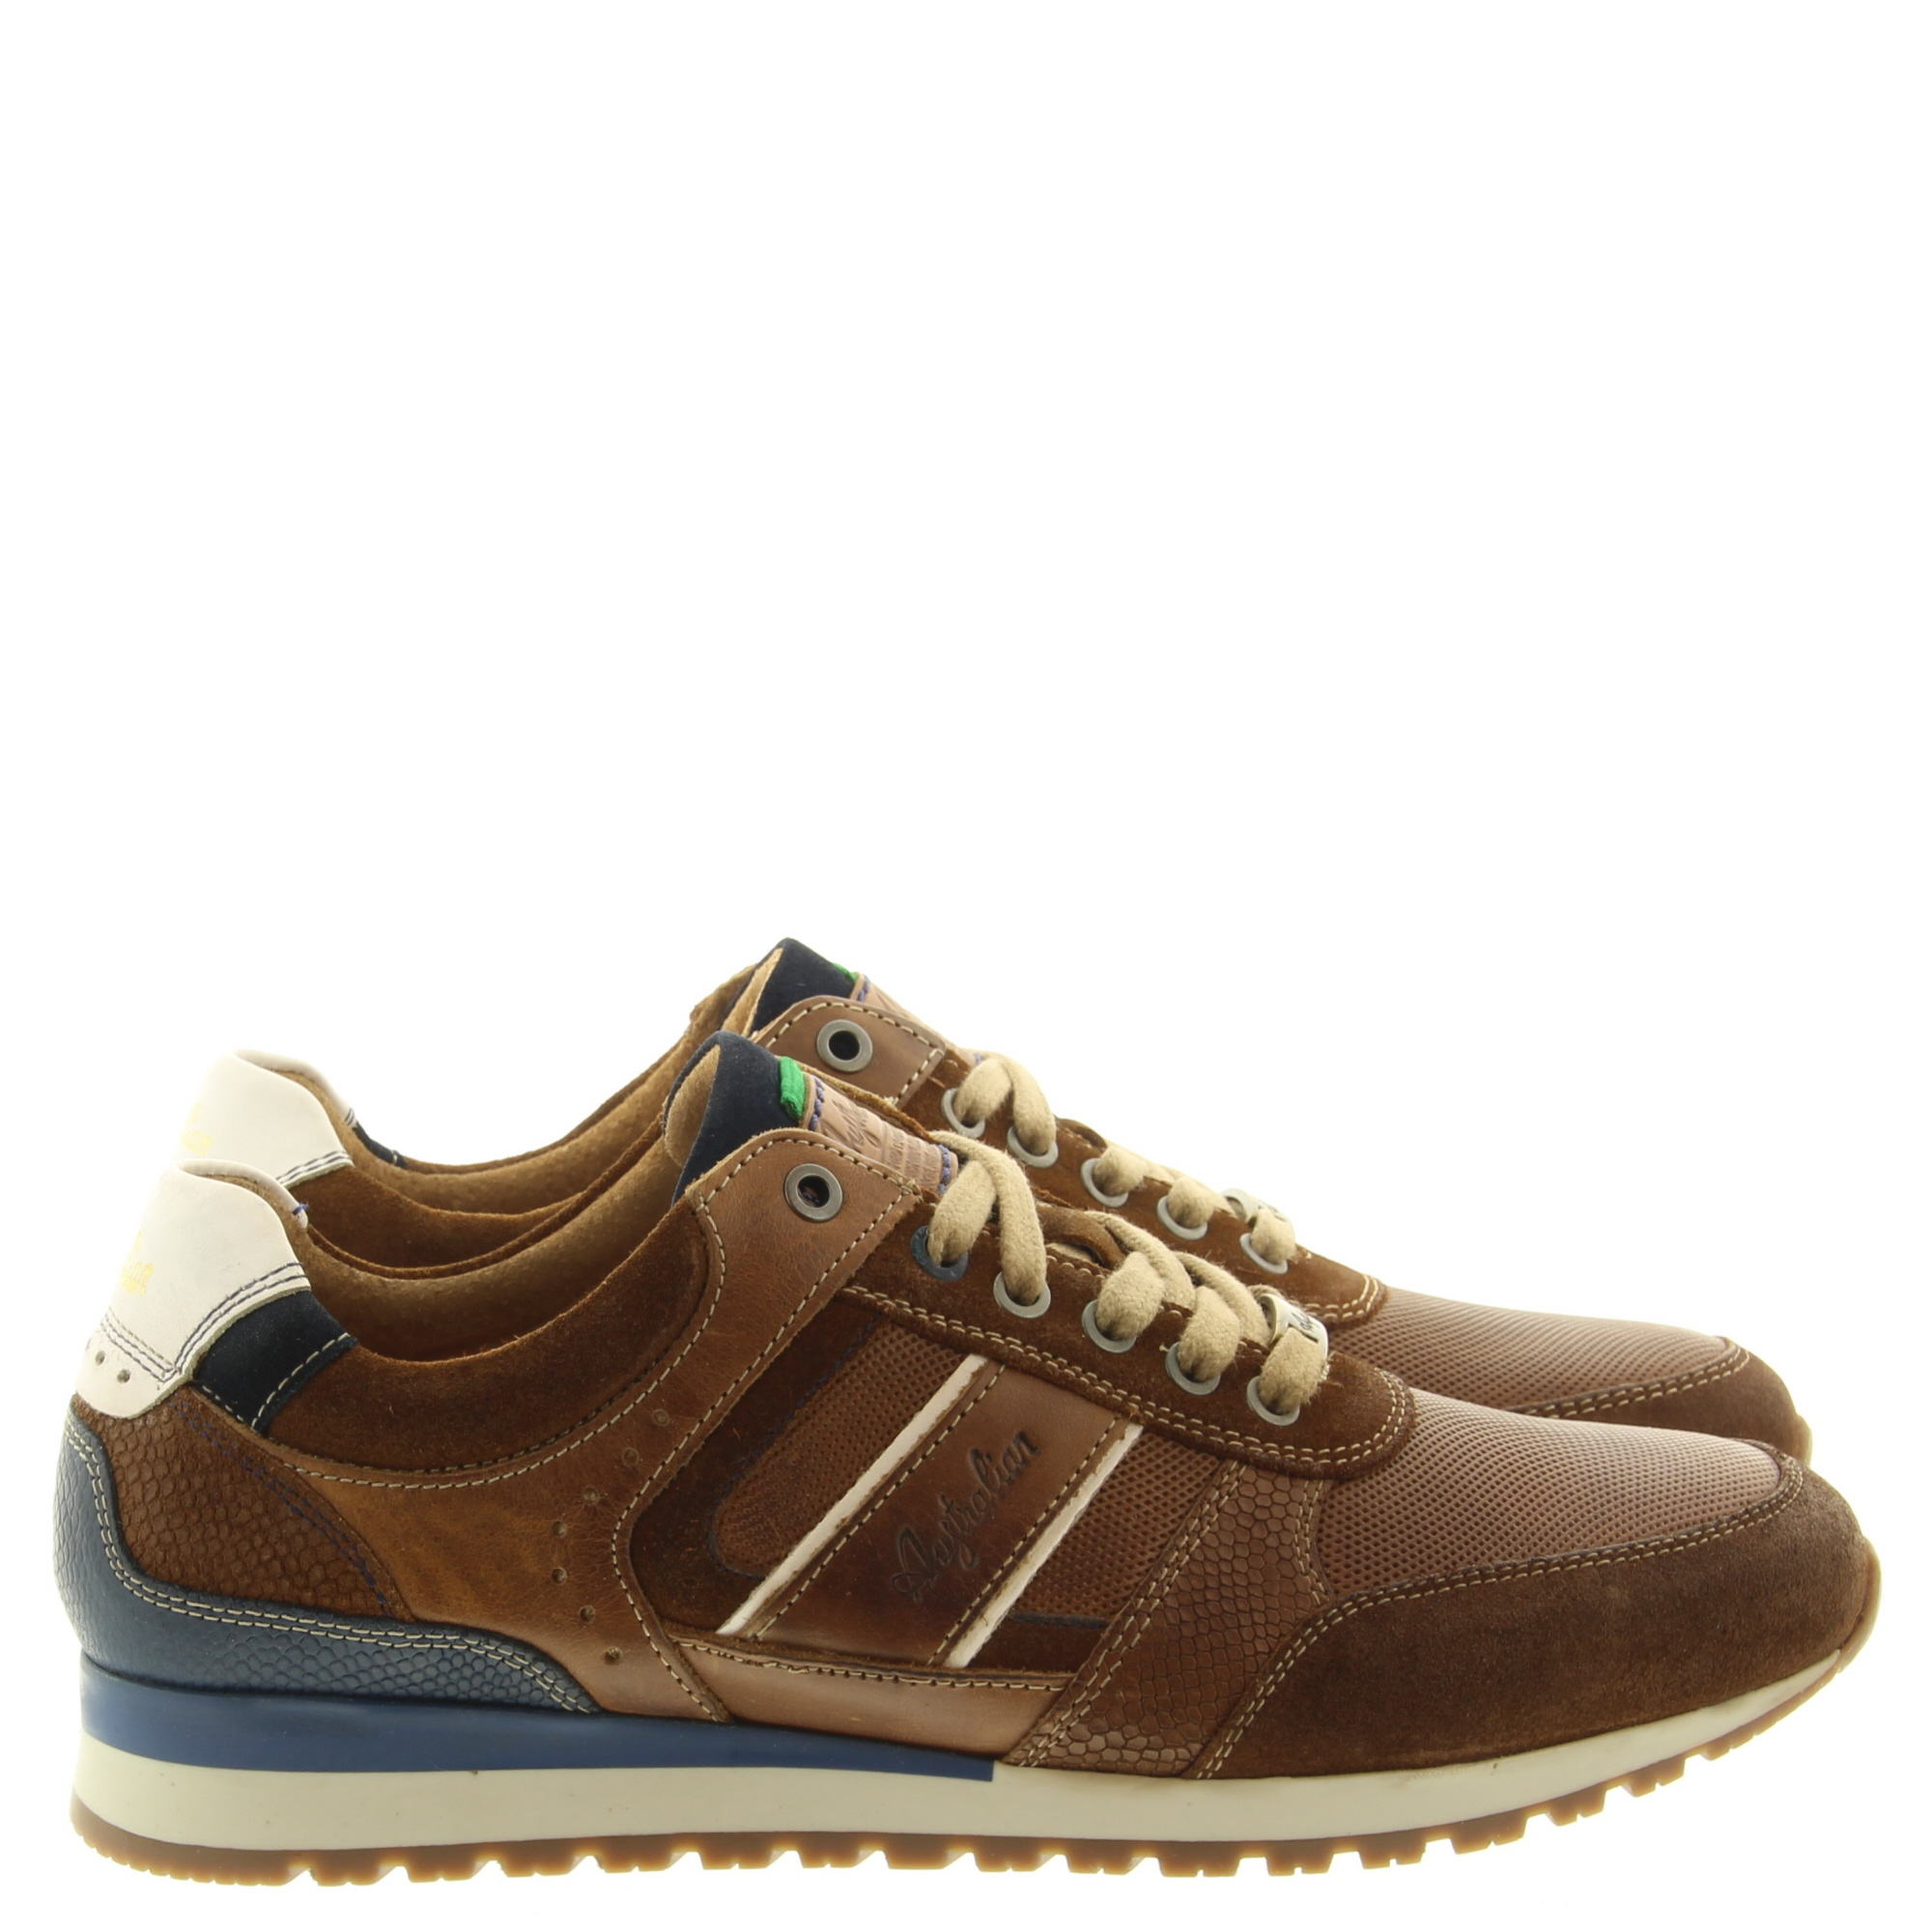 Australian Footwear Condor 15.1504.02 T30 Tan-Blue-White